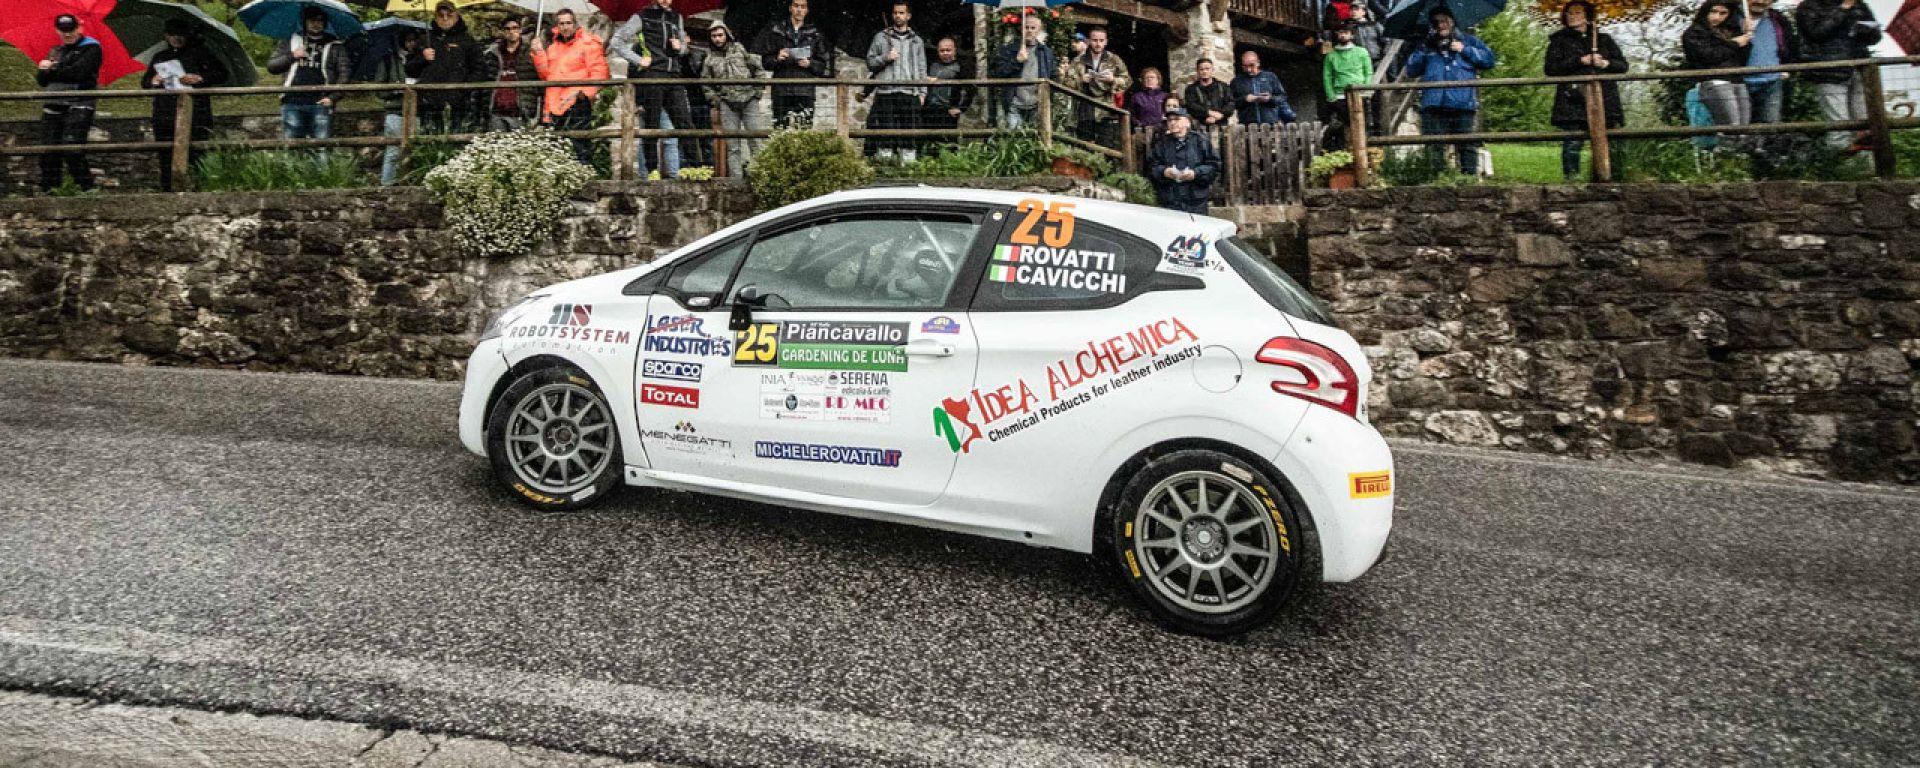 Rovatti - Peugeot 208 R2b Rally Piancavallo